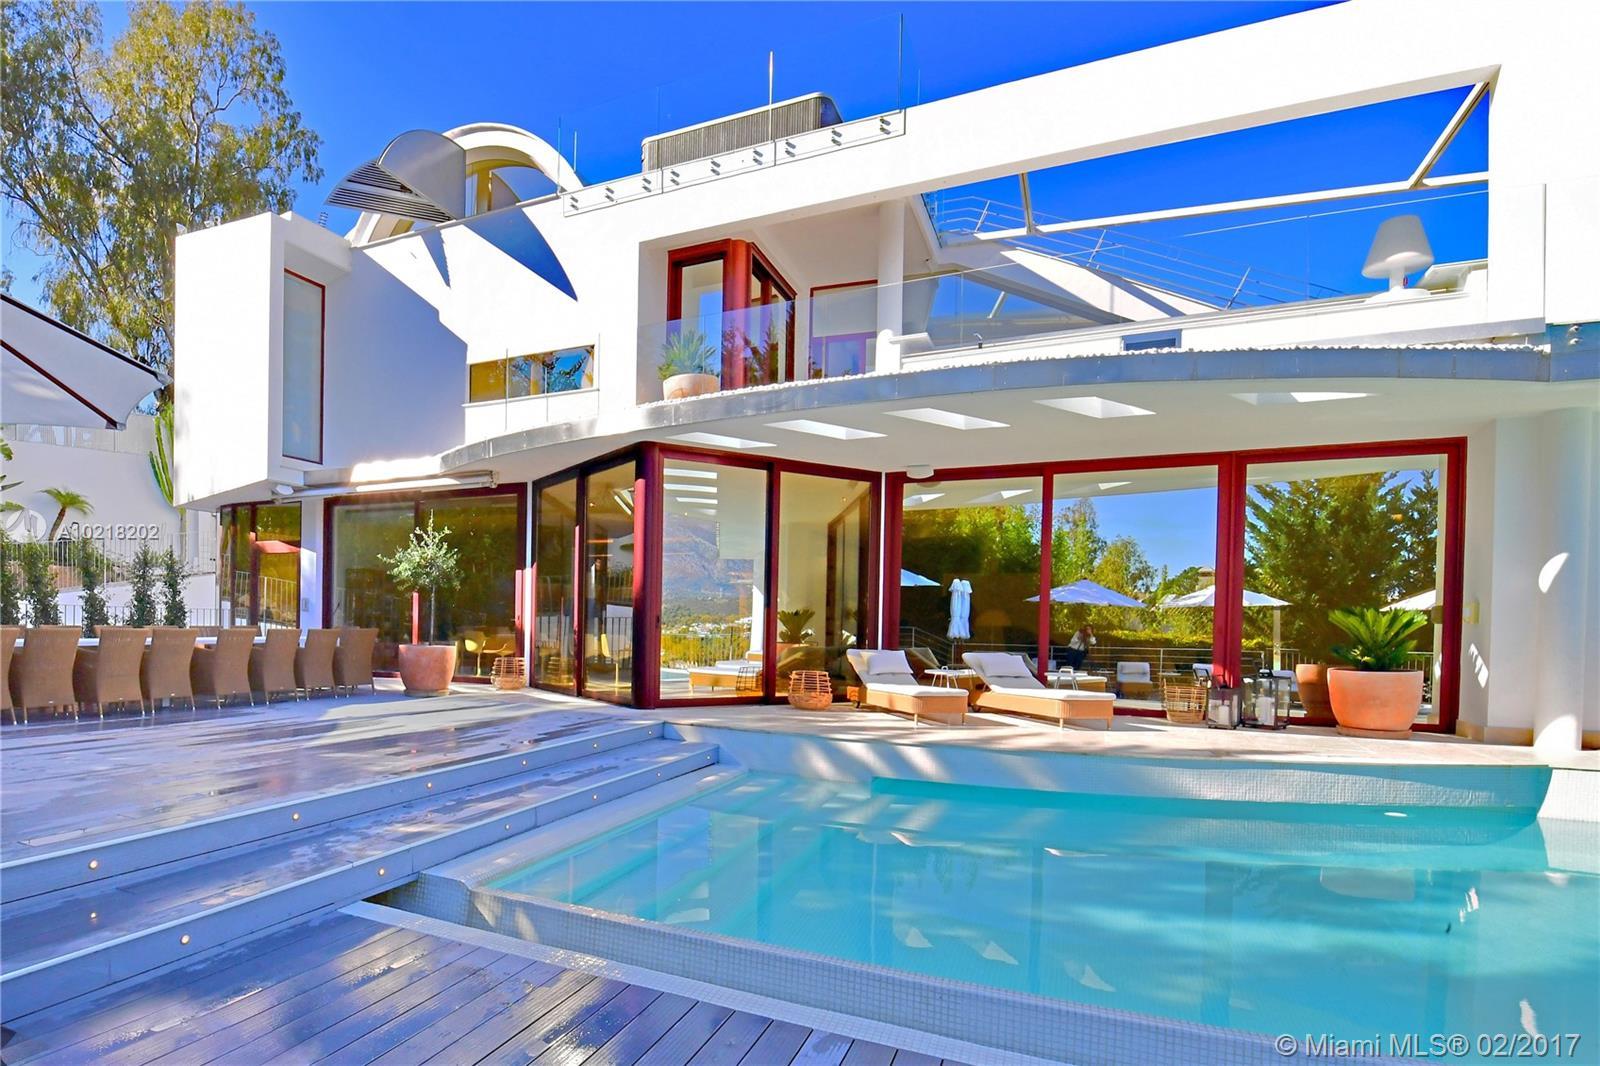 Ave Calderon de Barca 4A-H Nueva Marbella, Spain  For Sale A10218202, FL